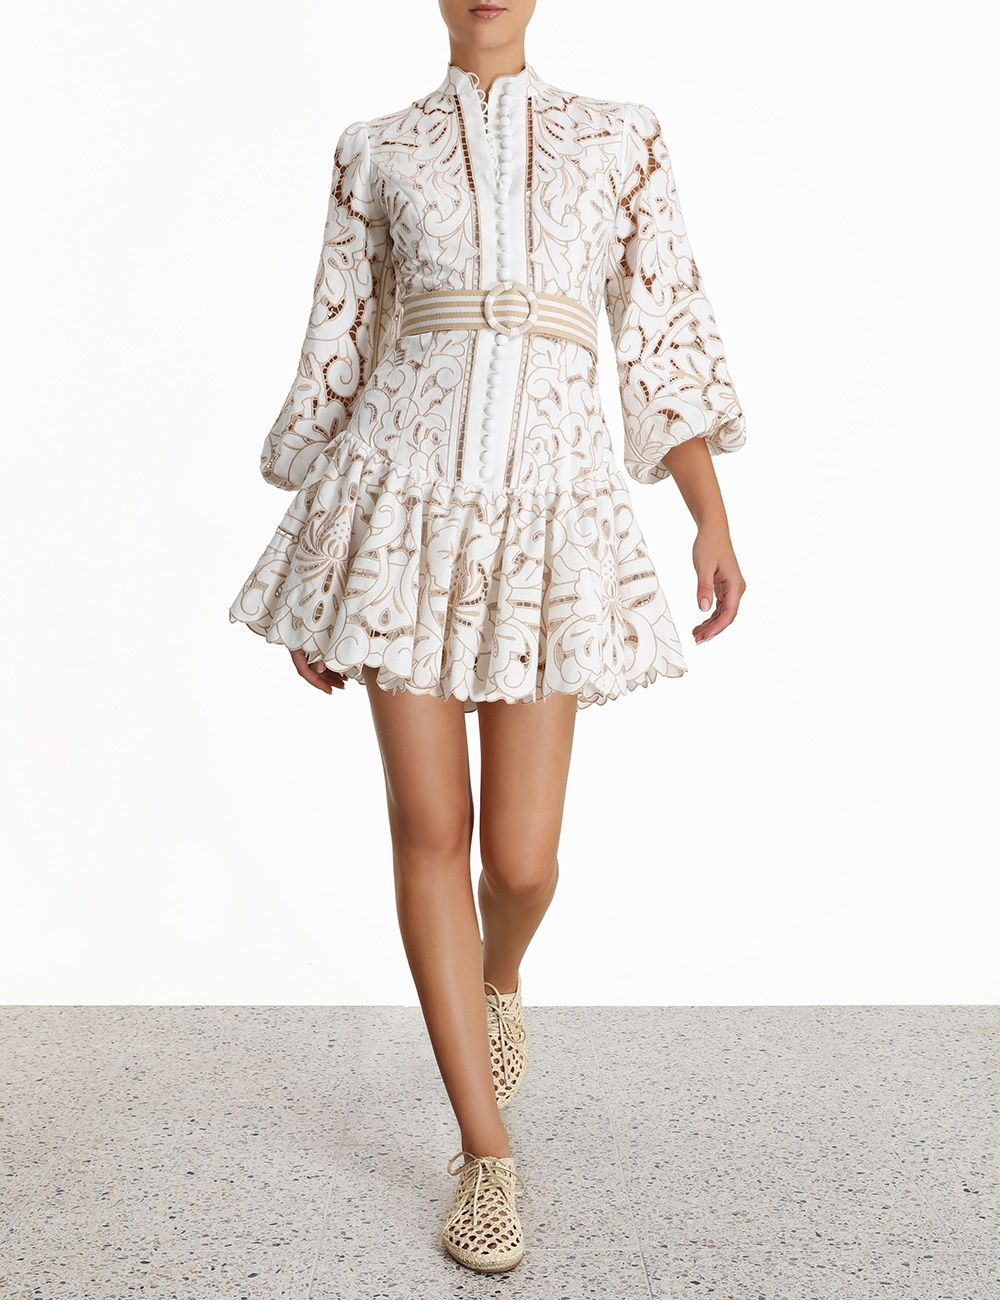 Edie Button Down Short Dress